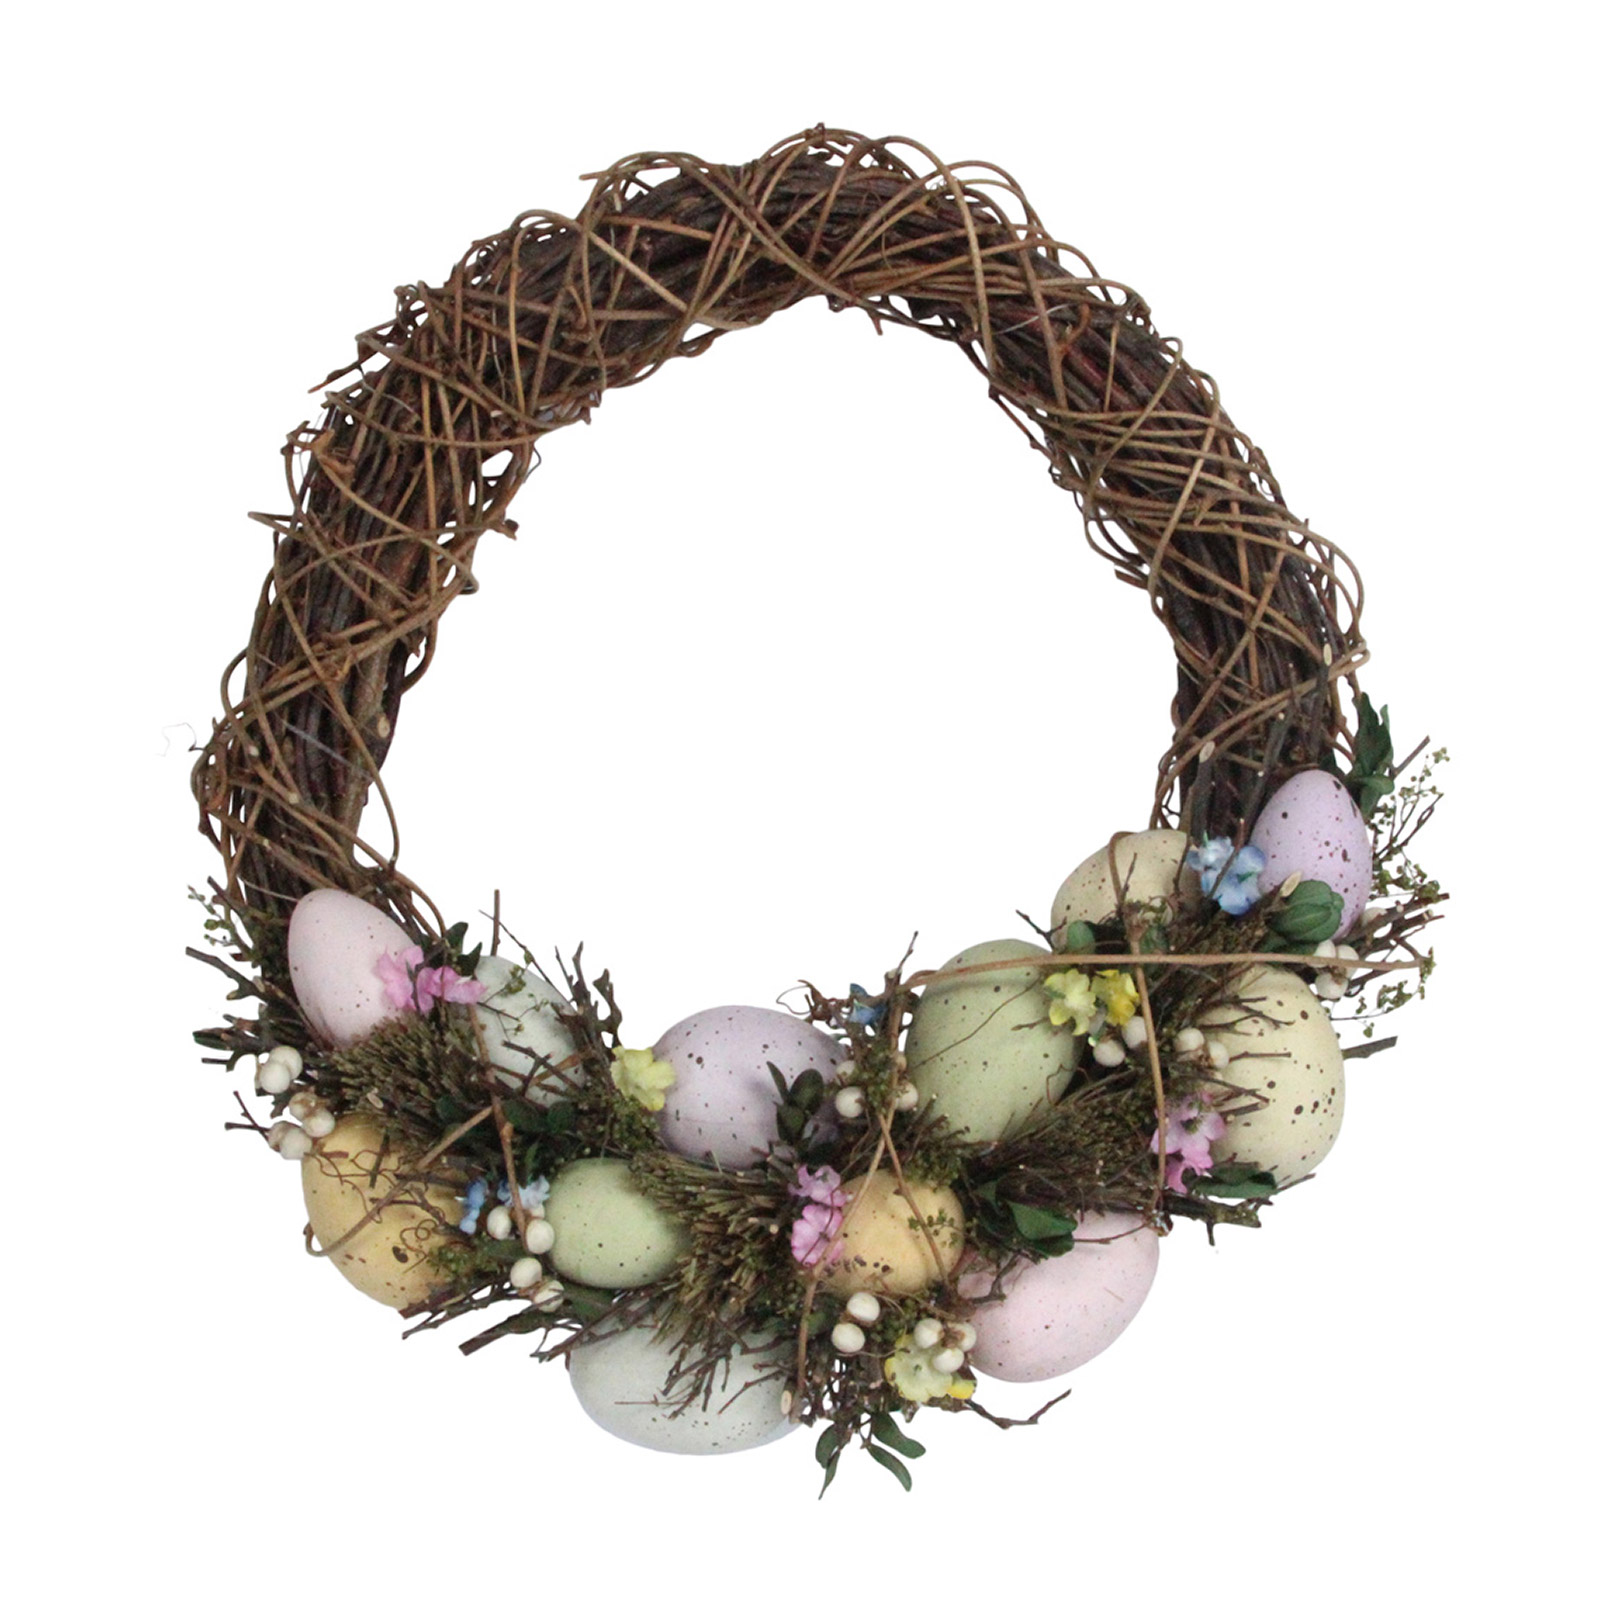 Gisela-Graham-Primavera-Corona-Decoracion-de-Mesa-de-huevos-de-Pascua-Flores-Casa-Puerta-Floral miniatura 19